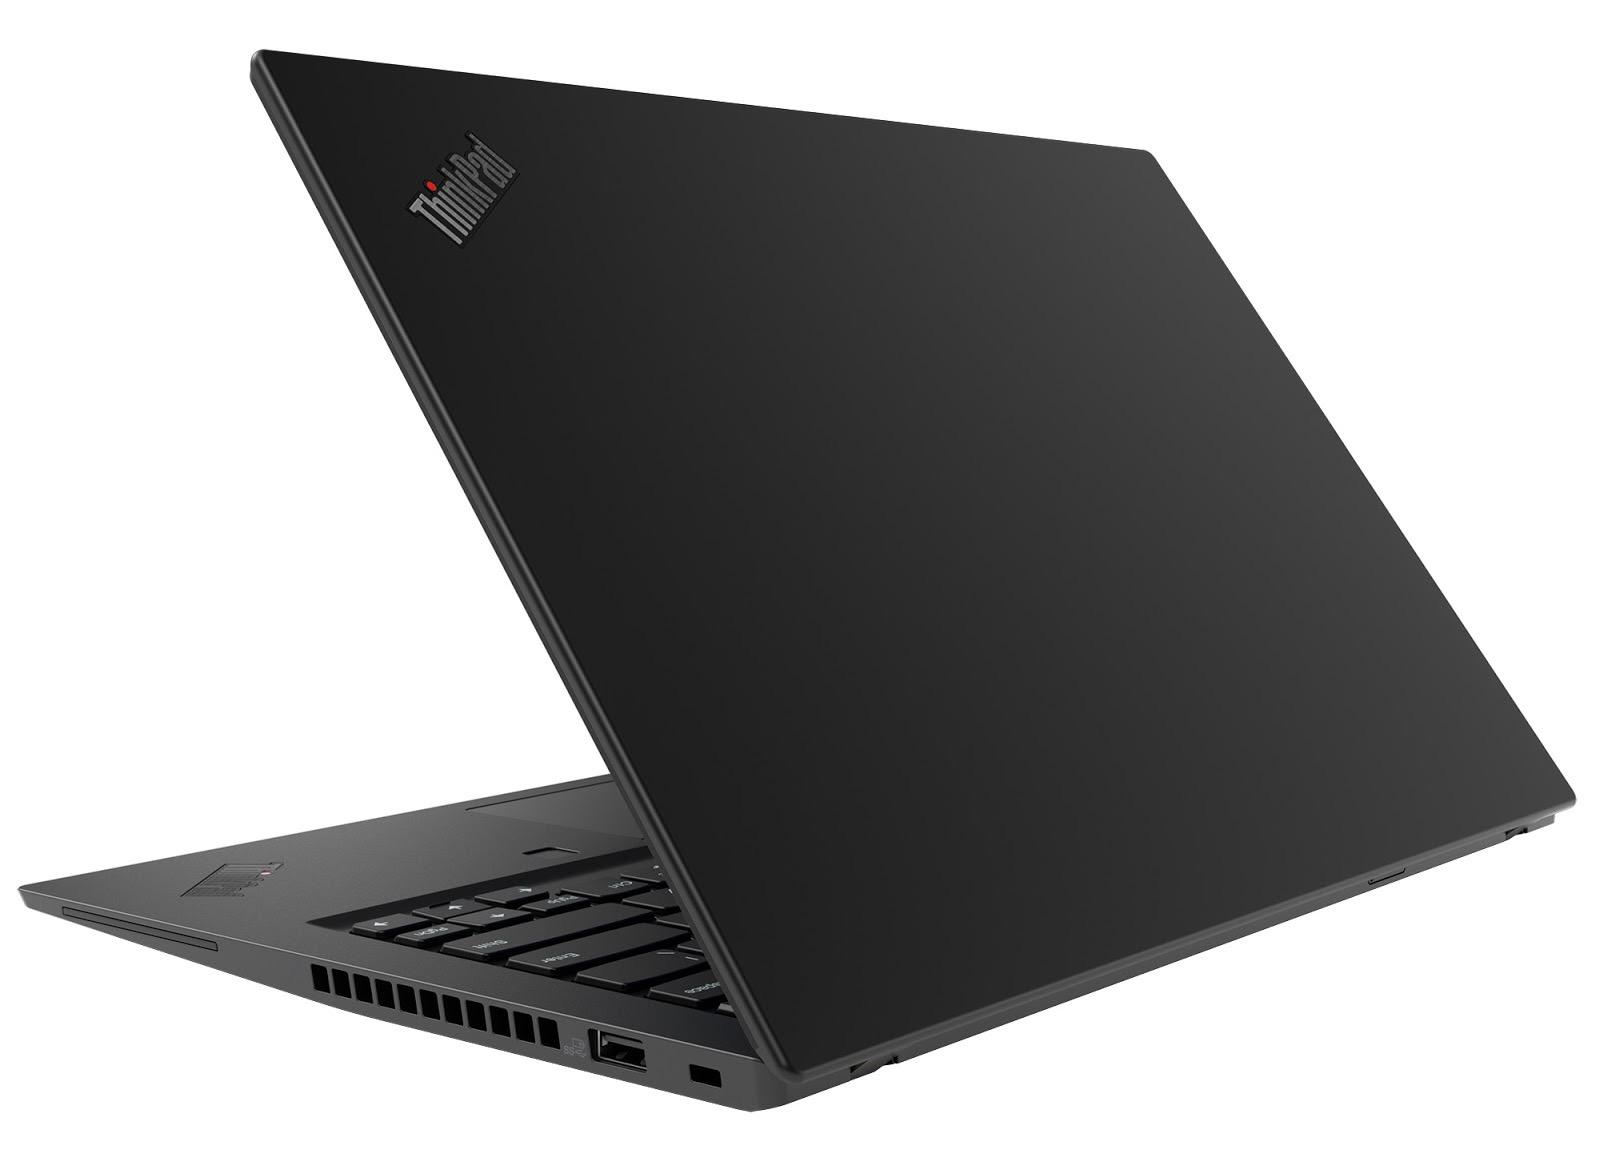 Фото 2. Ноутбук Lenovo ThinkPad T14s Gen 1 Black (20T00020RT)